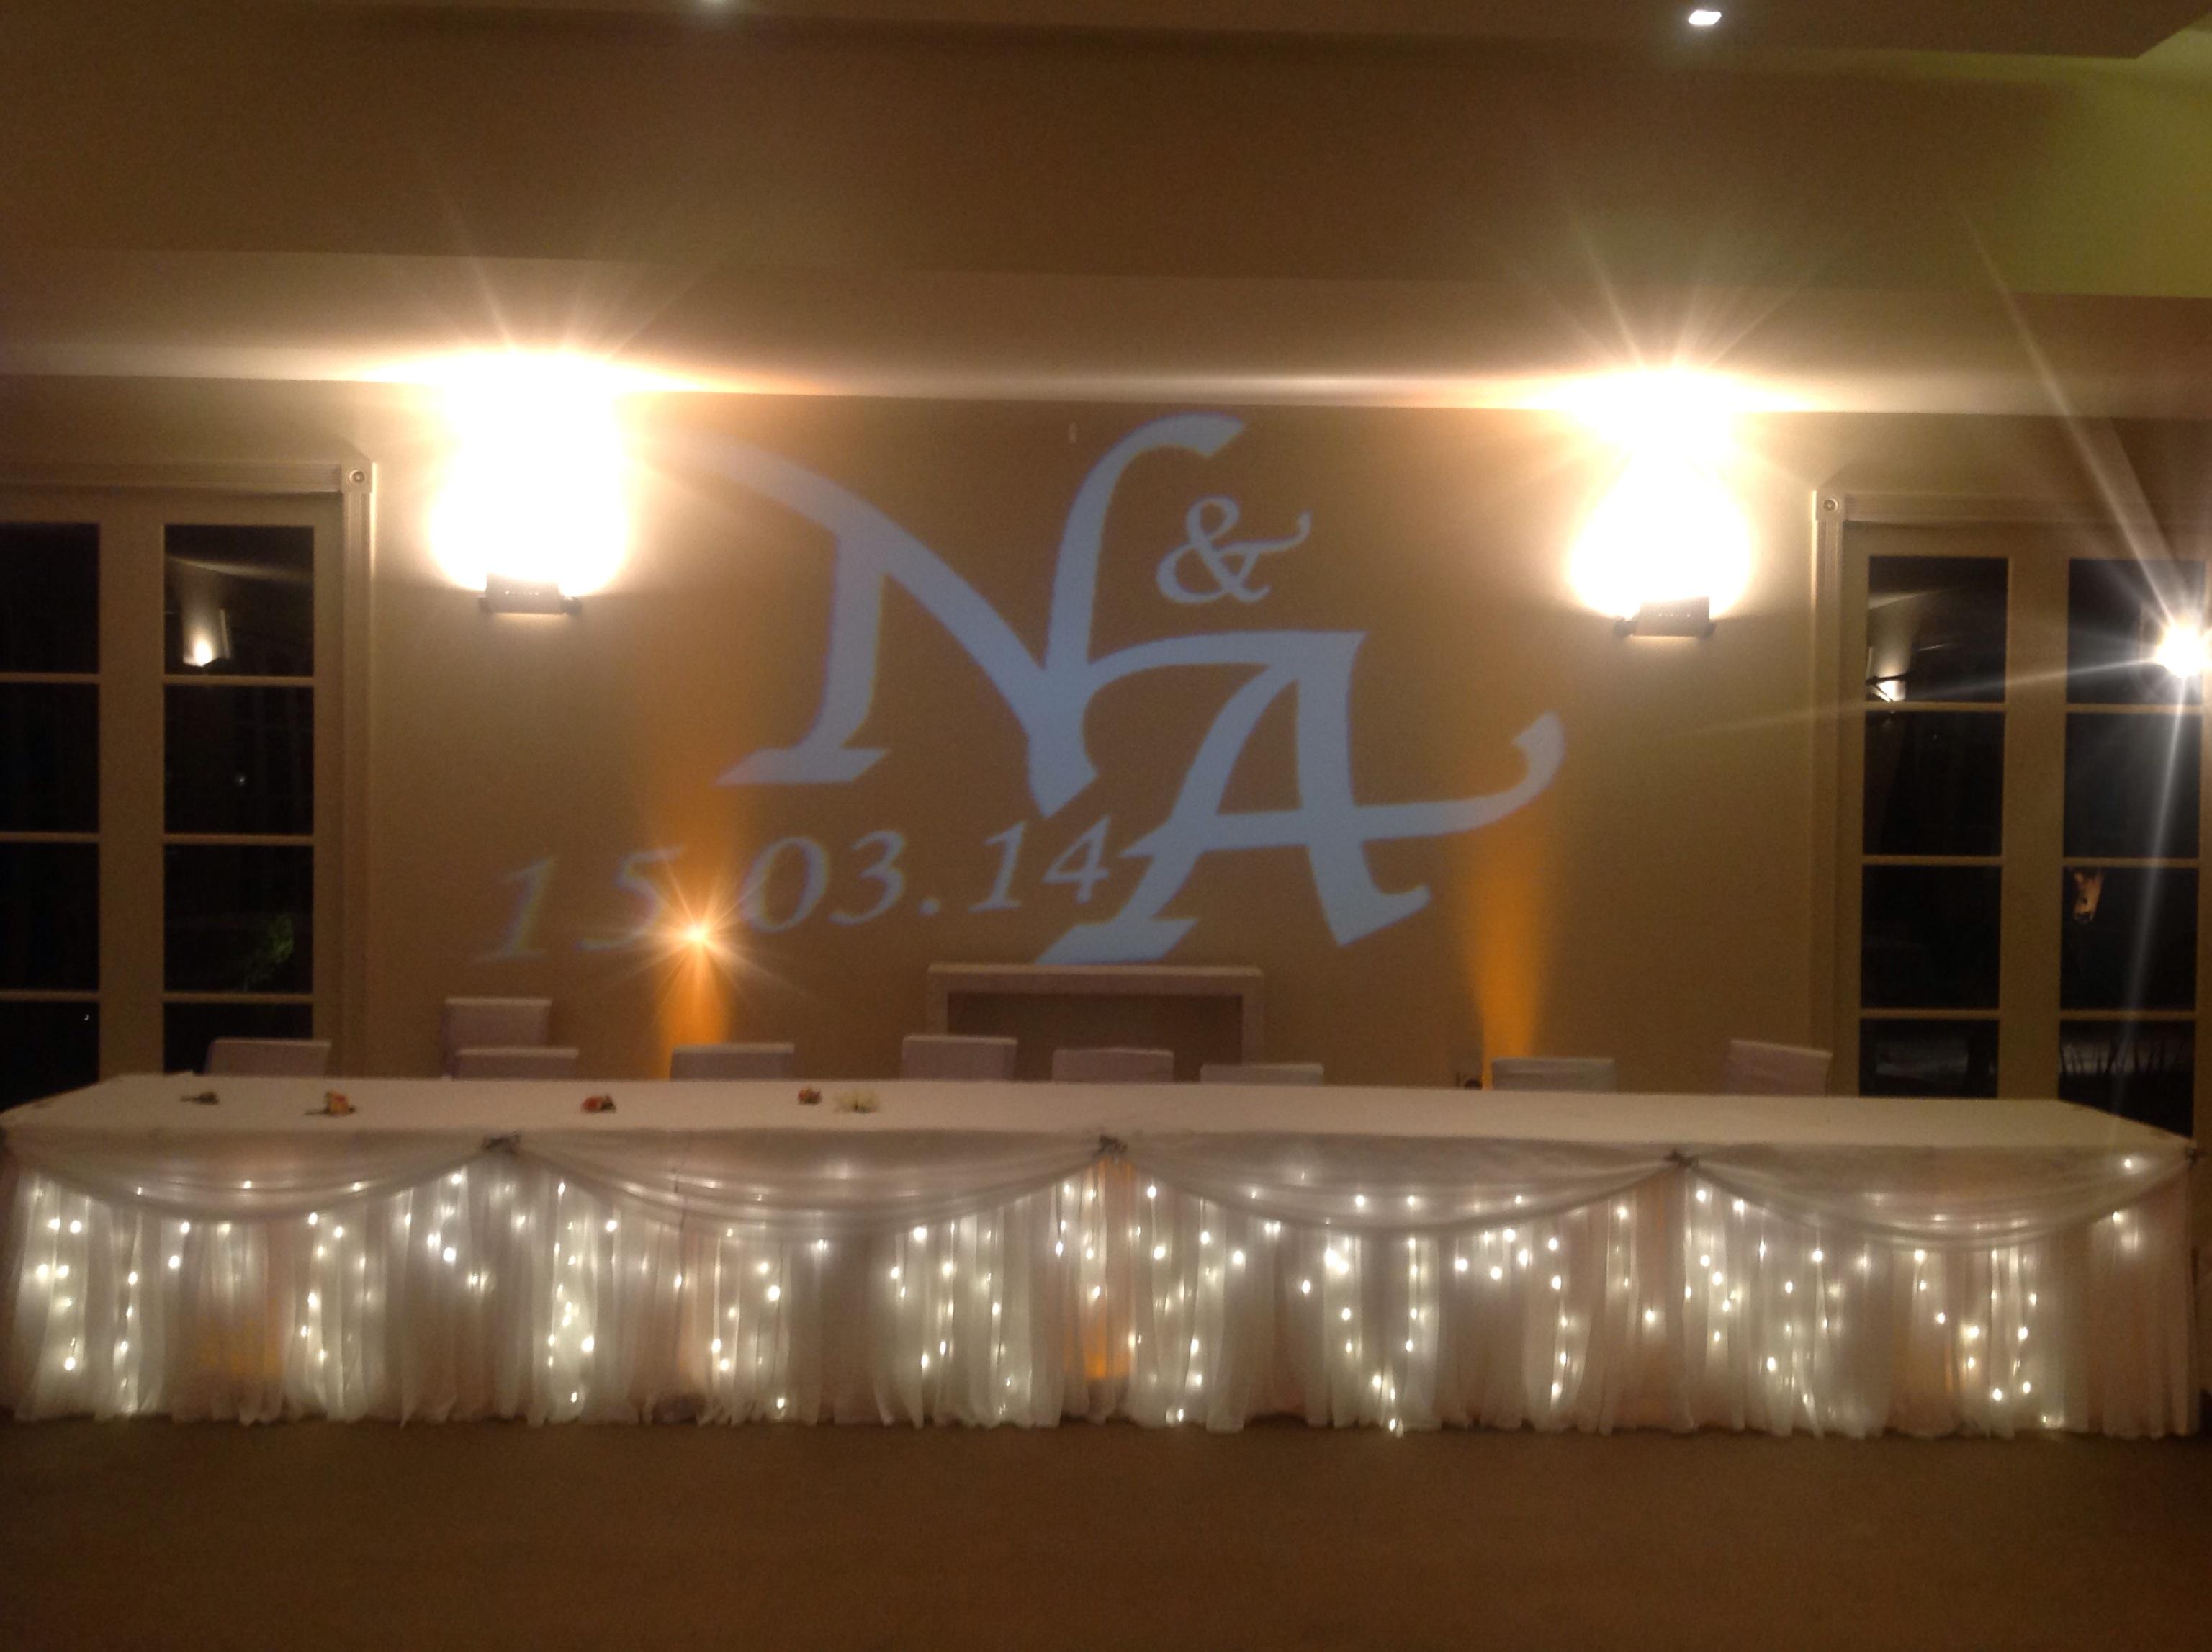 How Lighting Can Affect Your Wedding: Uplighting & Monogram Lighting